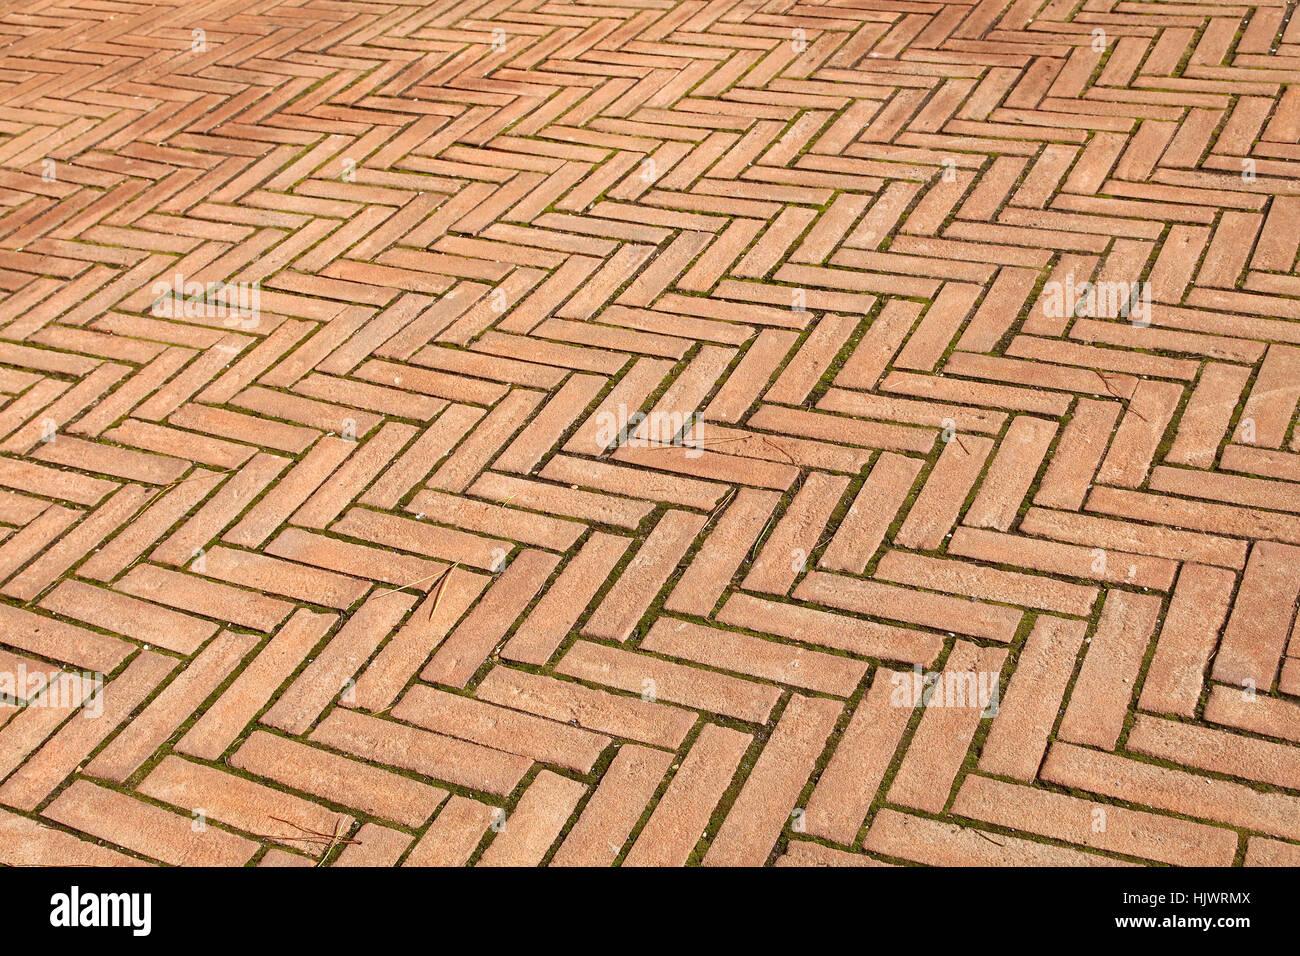 Pavement tiles roman pattern terracotta ceramic bricks pavement tiles roman pattern terracotta ceramic bricks floor antique dailygadgetfo Images